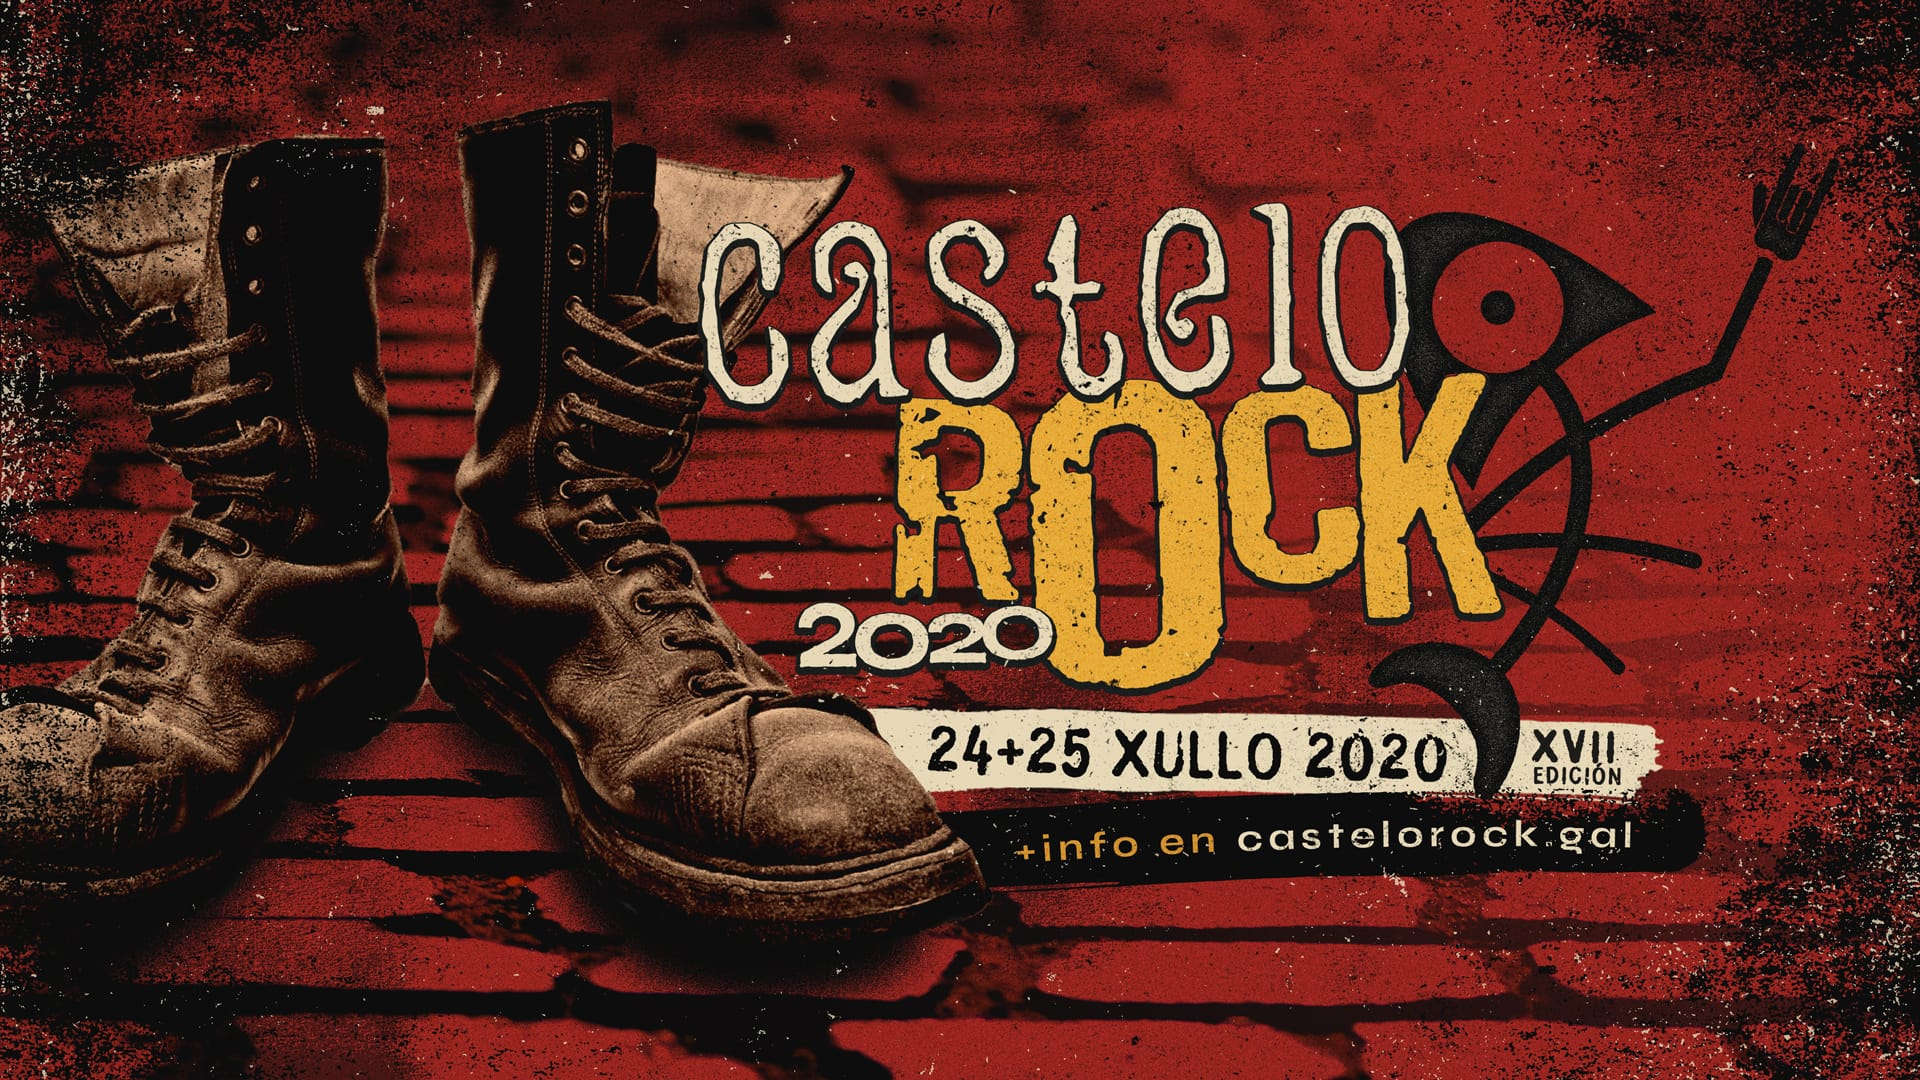 festival castelo rock 2020 157485267908